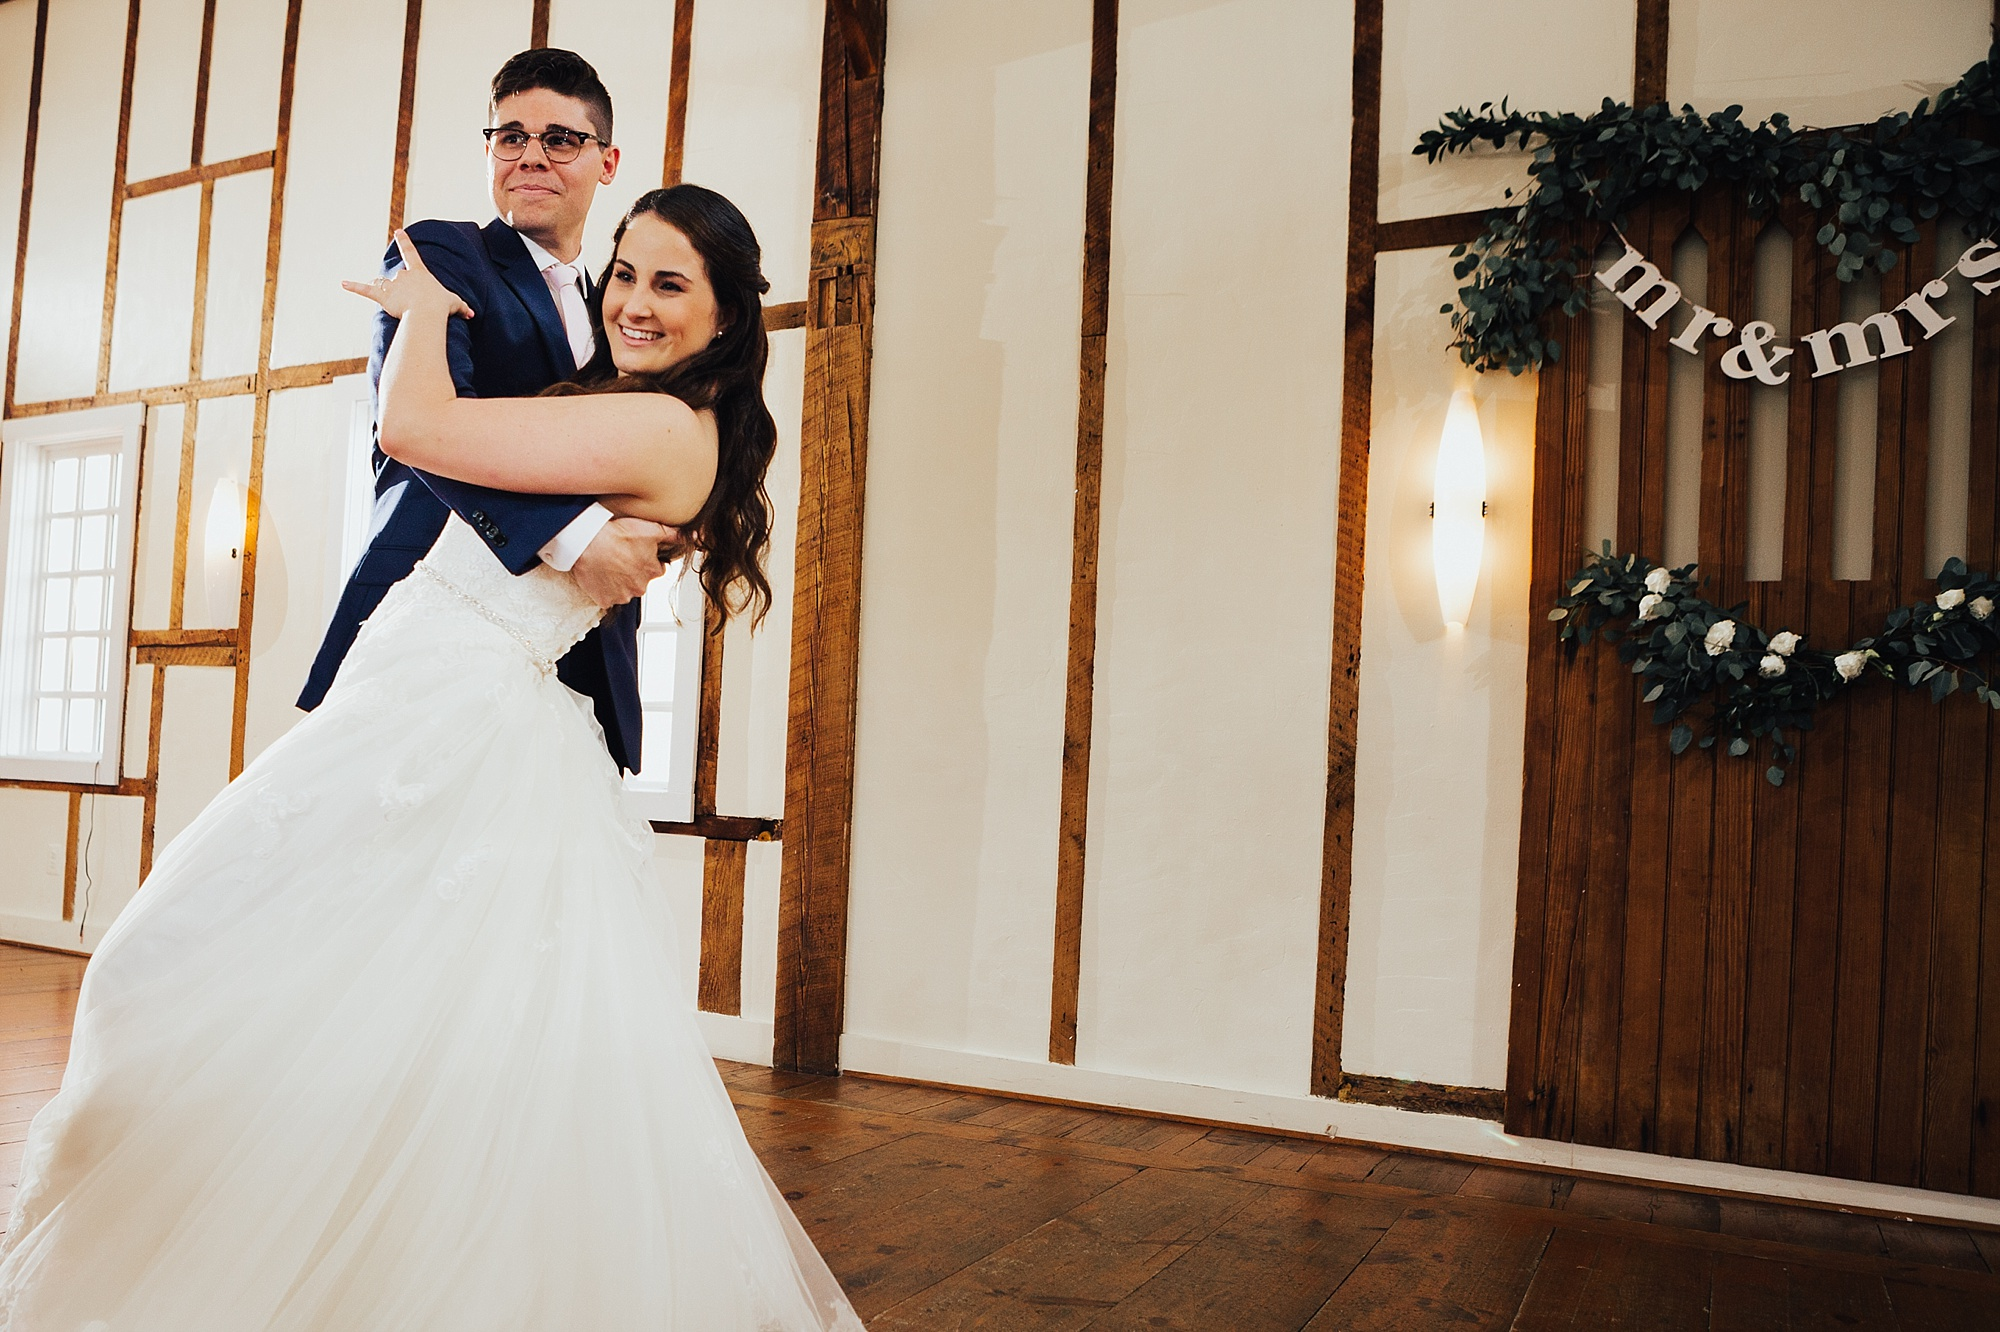 Love_by_Joe_Mac_Nicole_Patrick_Gables_At_Chadds_Ford_Wedding_Photography_Best_Philadelphia__0084.jpg